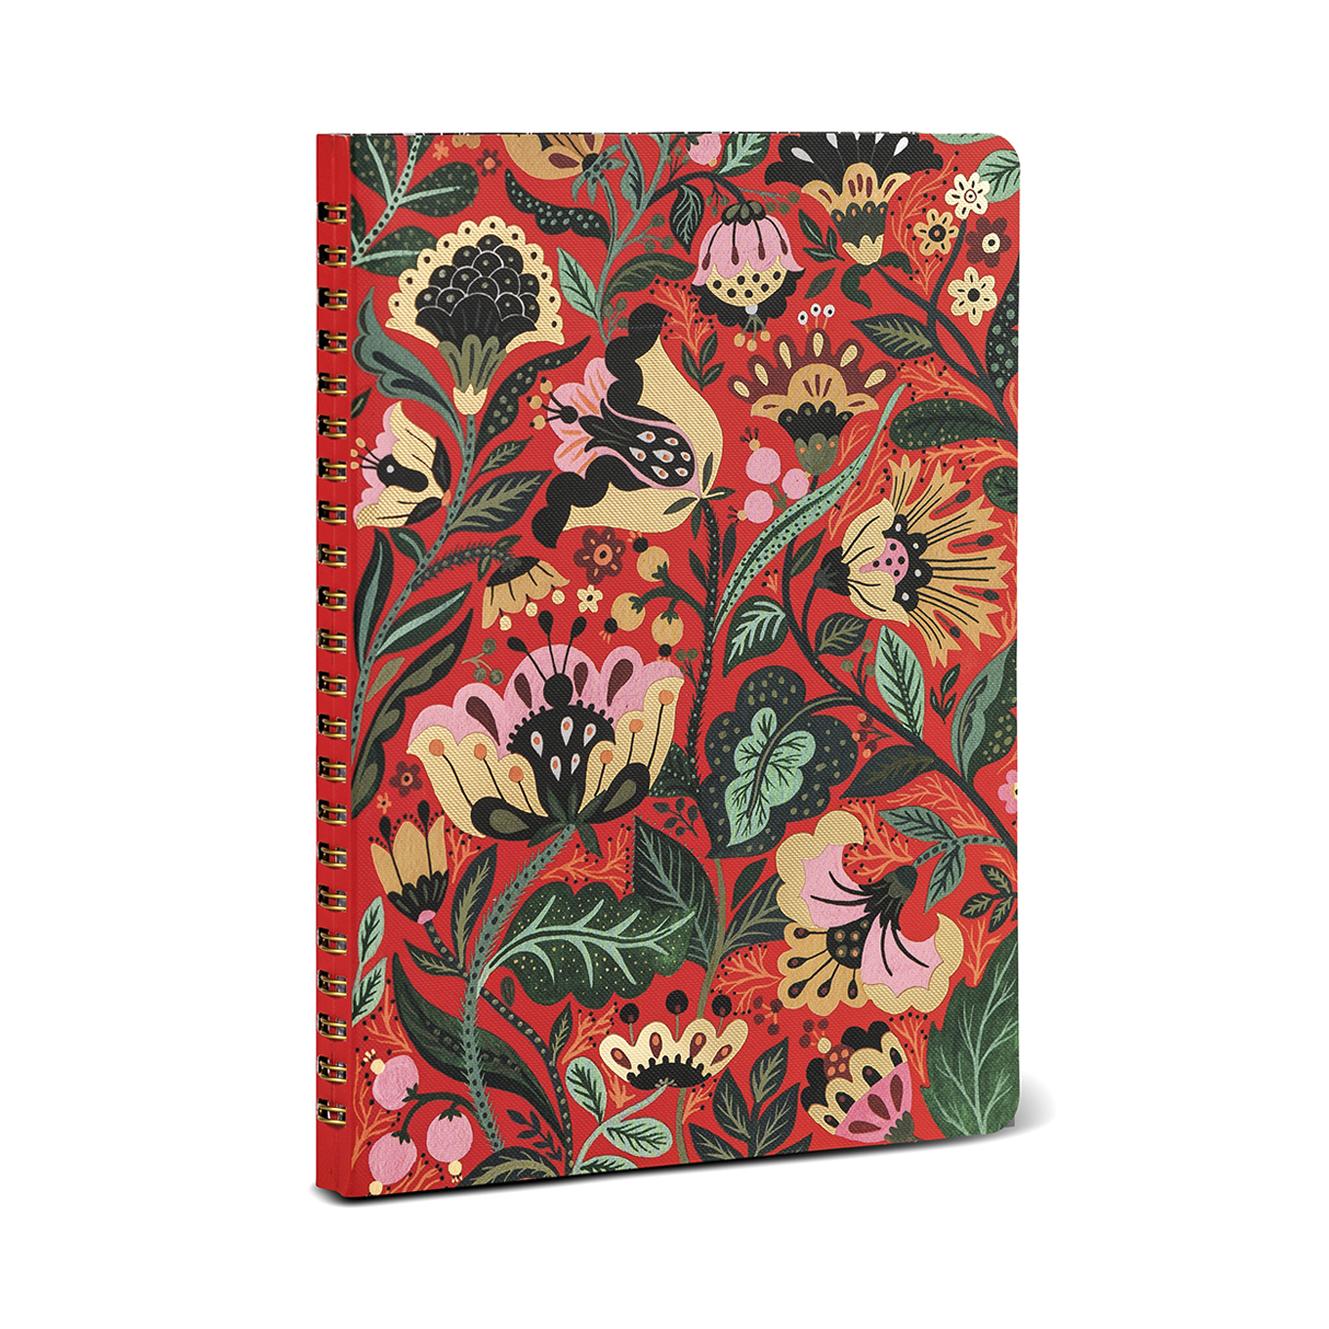 Copy of Copy of High Note Dinara Mirtalipova Personal Planning Notebook